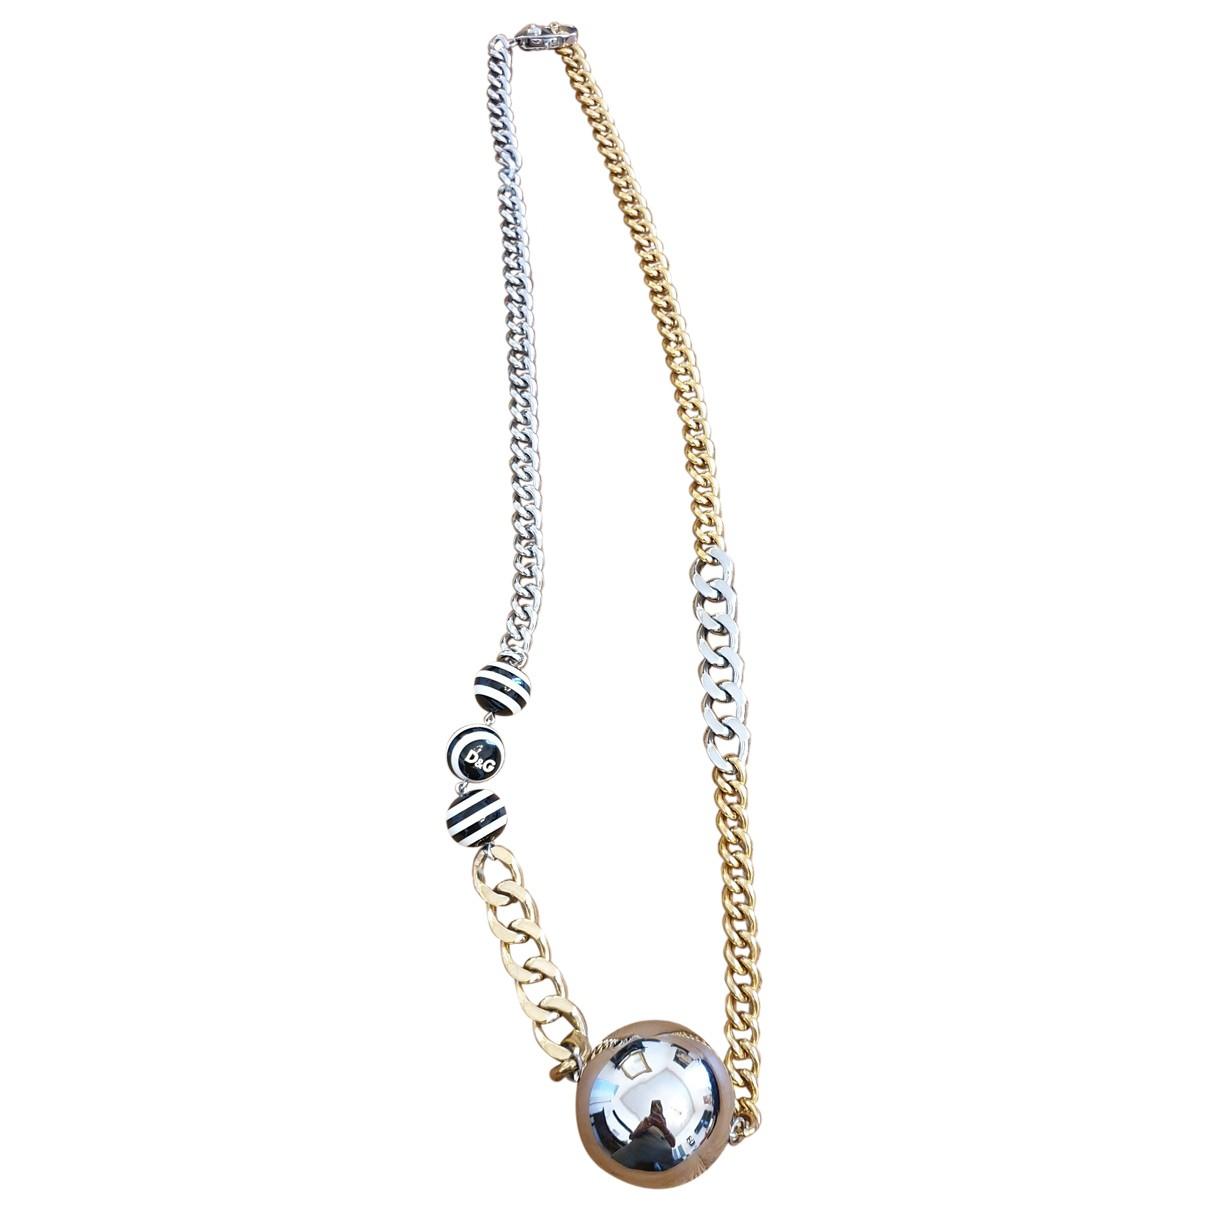 Dolce & Gabbana \N Kette in  Gold Stahl